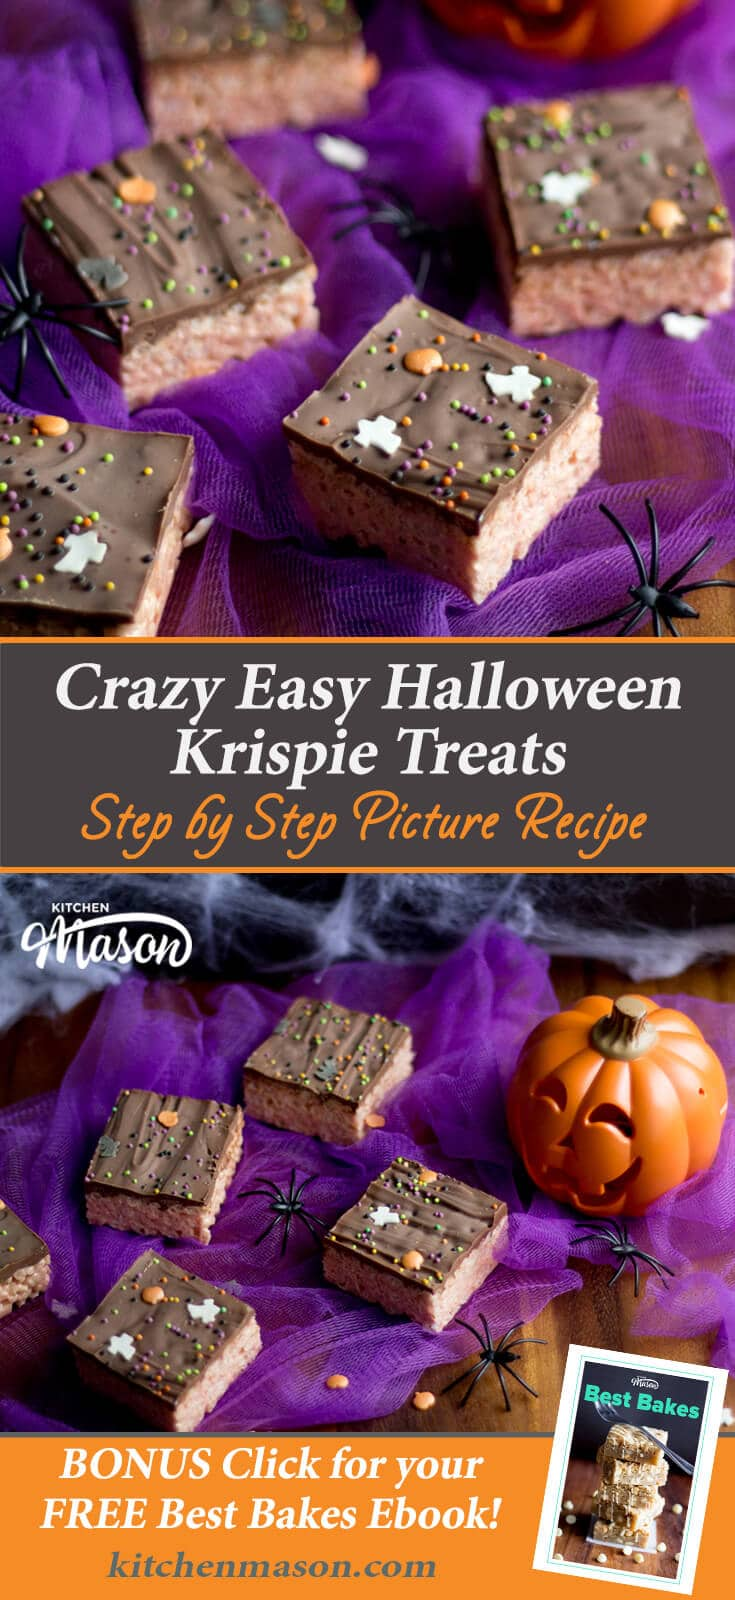 Halloween Rice Krispie Treats | Easy No Bake Halloween Recipes